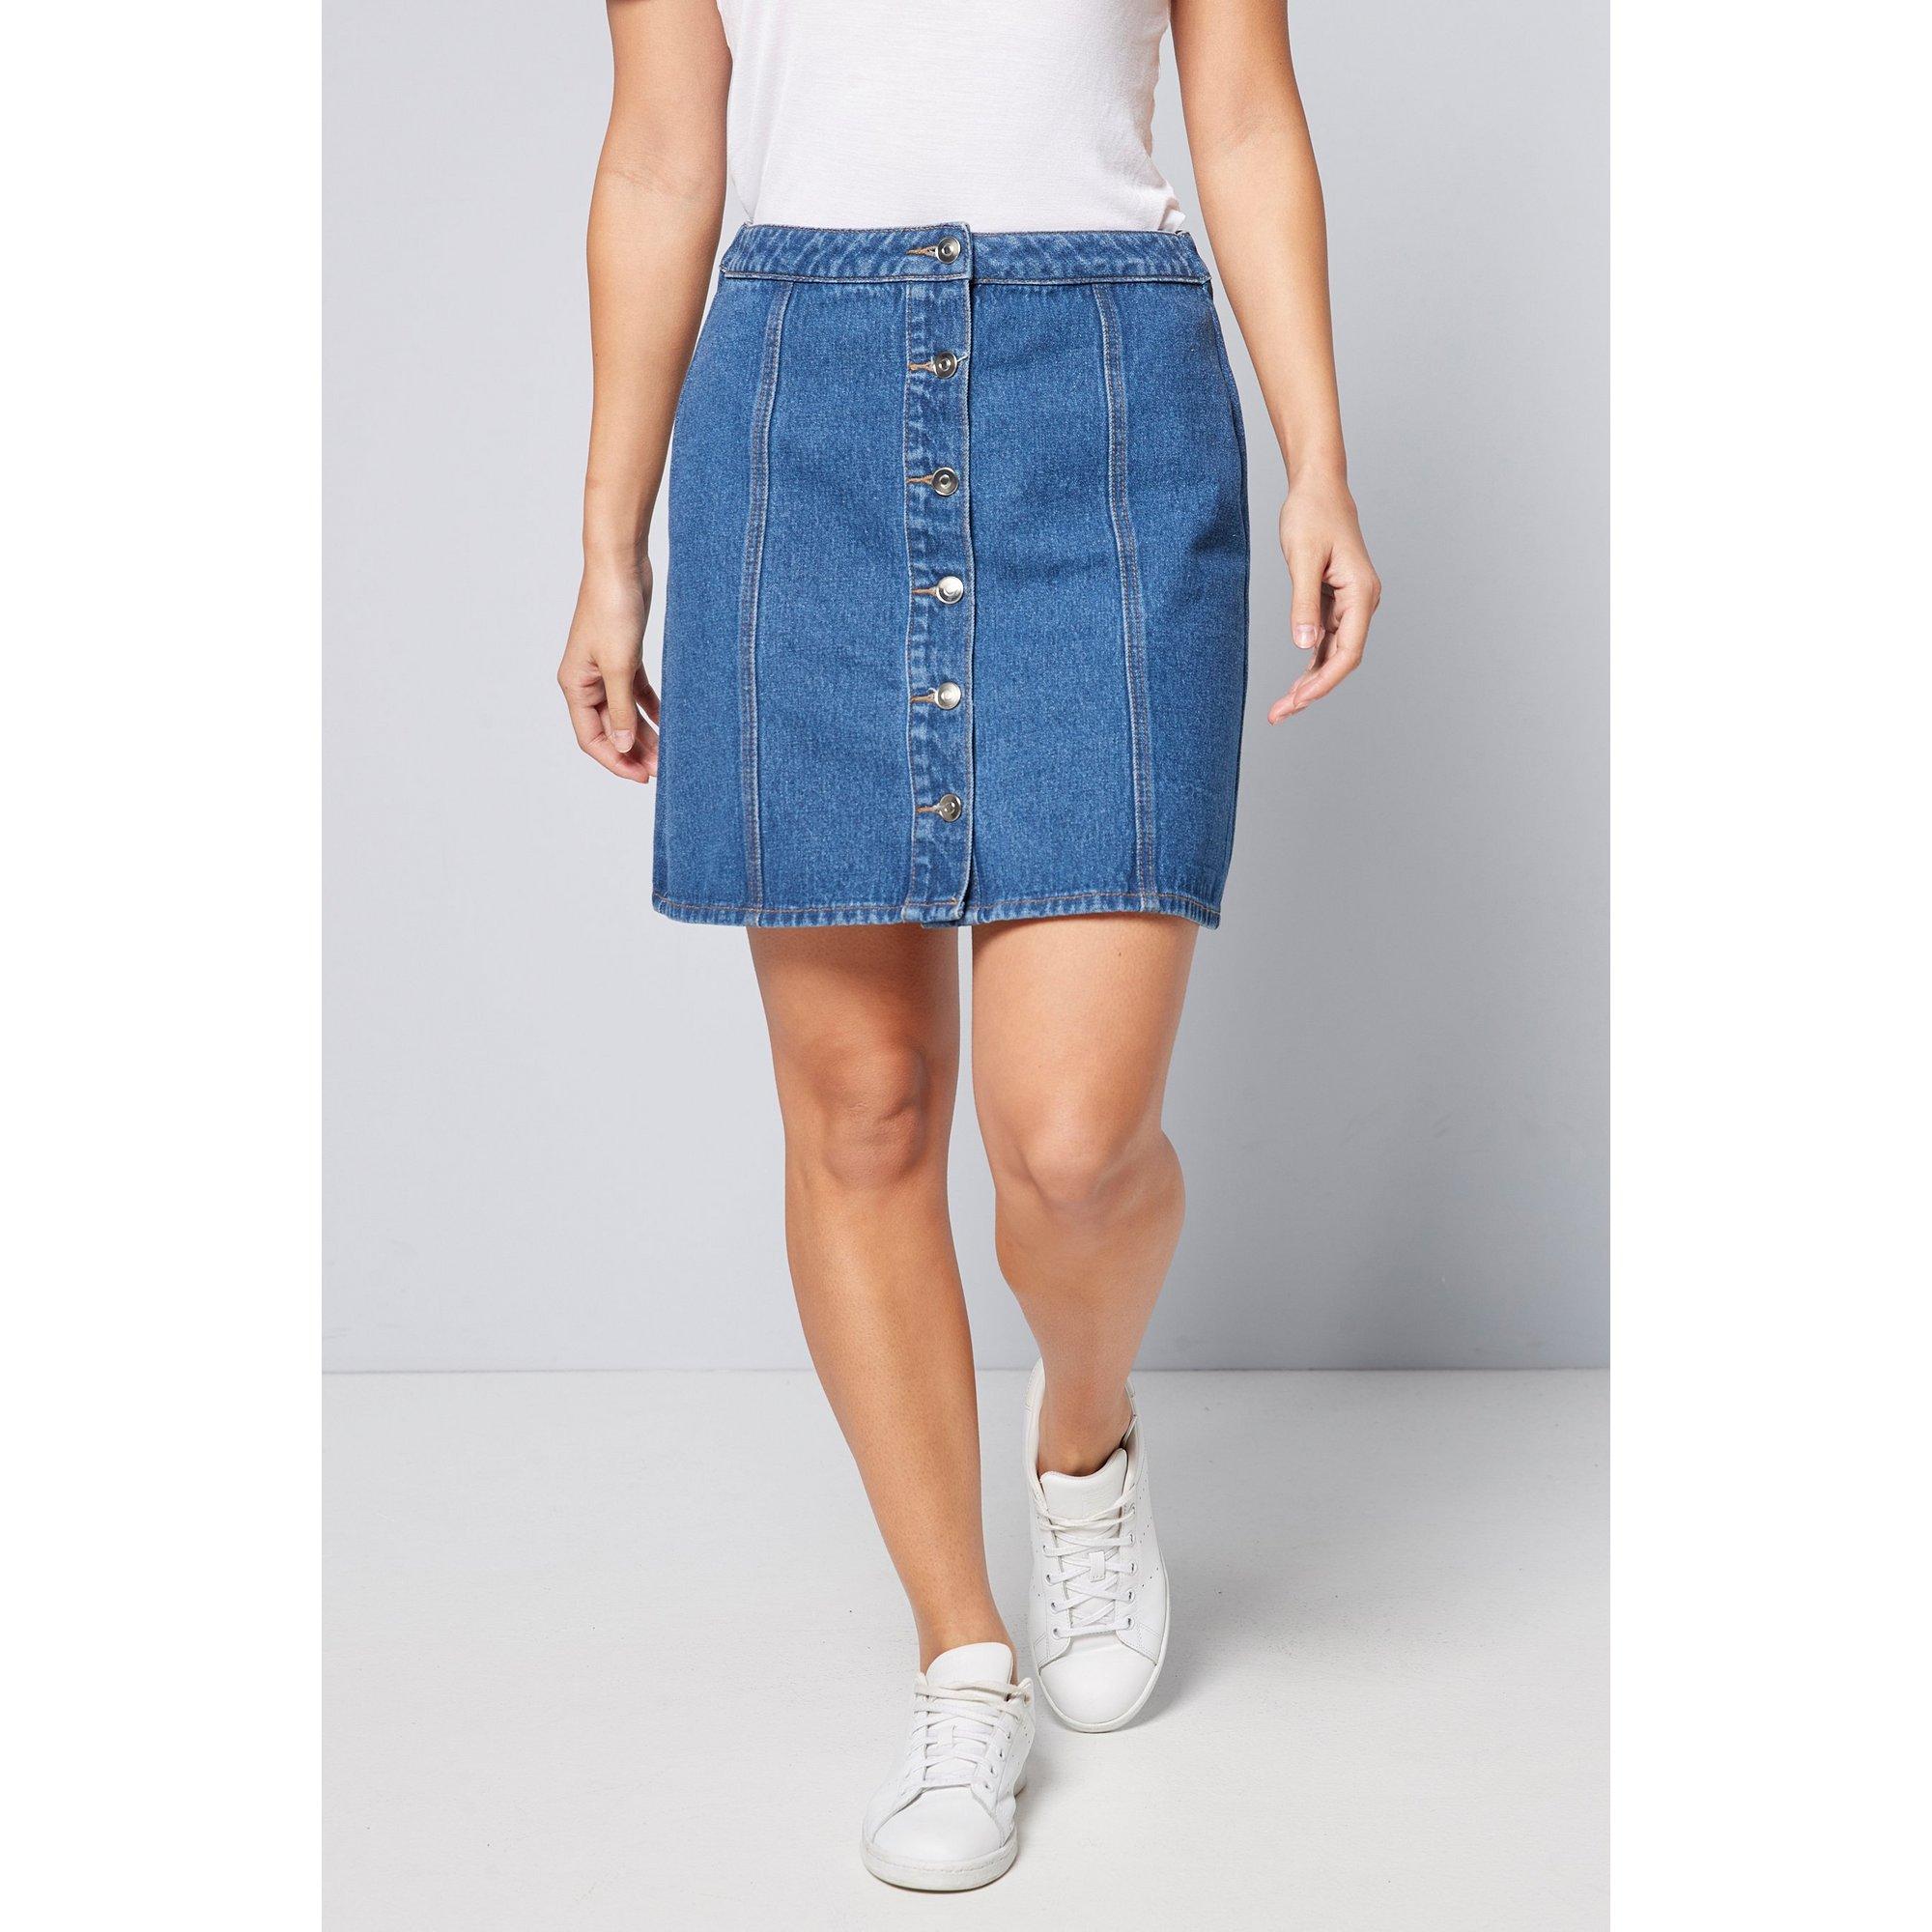 Image of Basic Indigo Denim Button Through Skirt